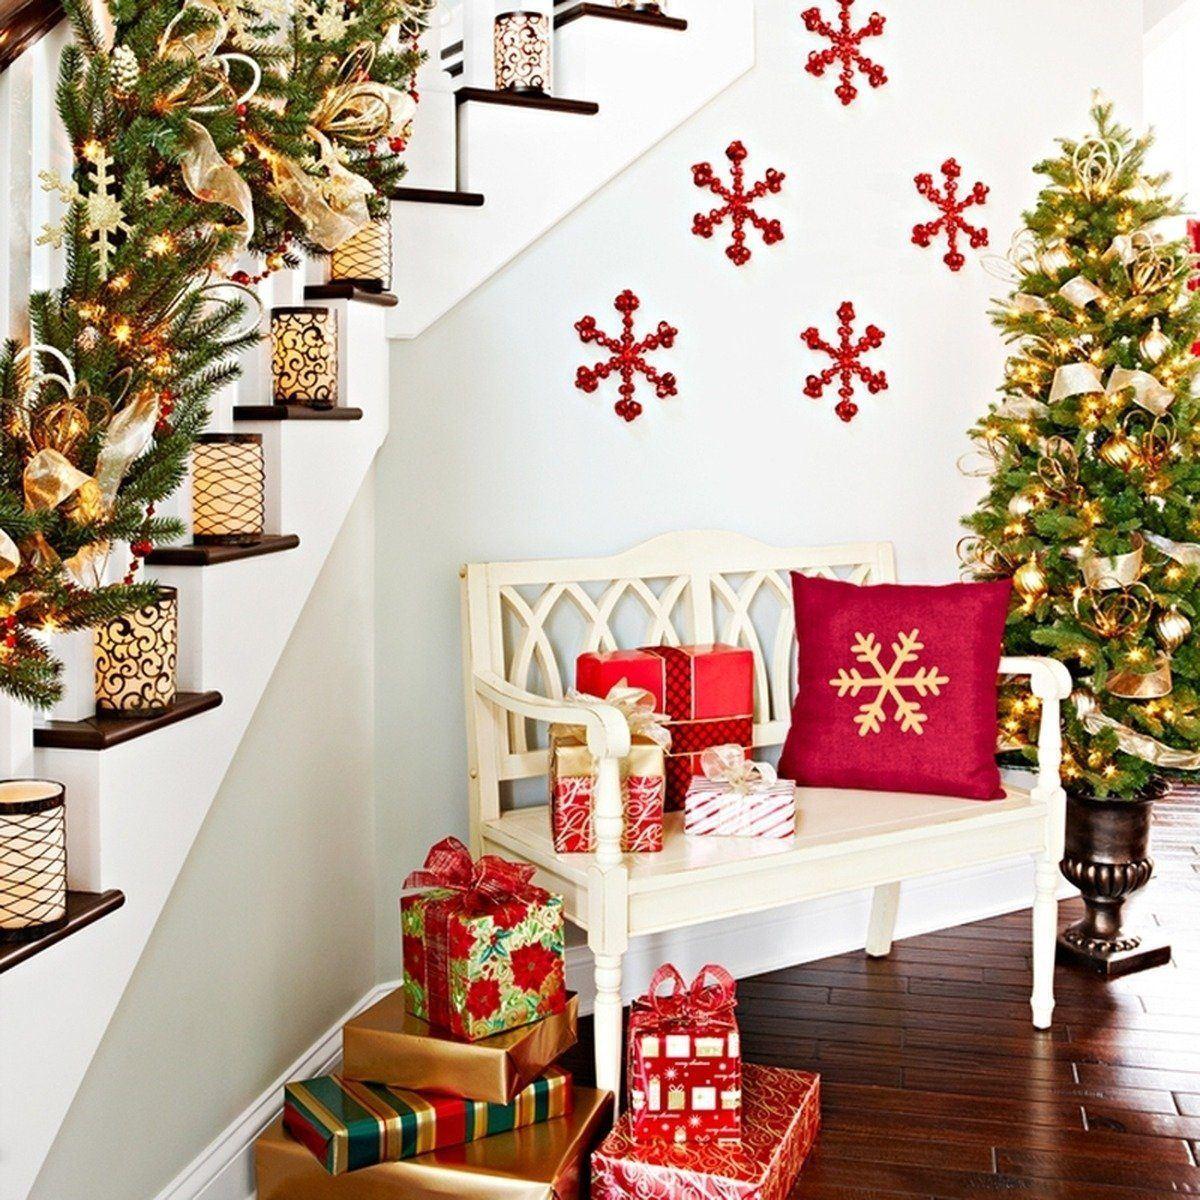 terrapapers-com-cristmas-decor-11